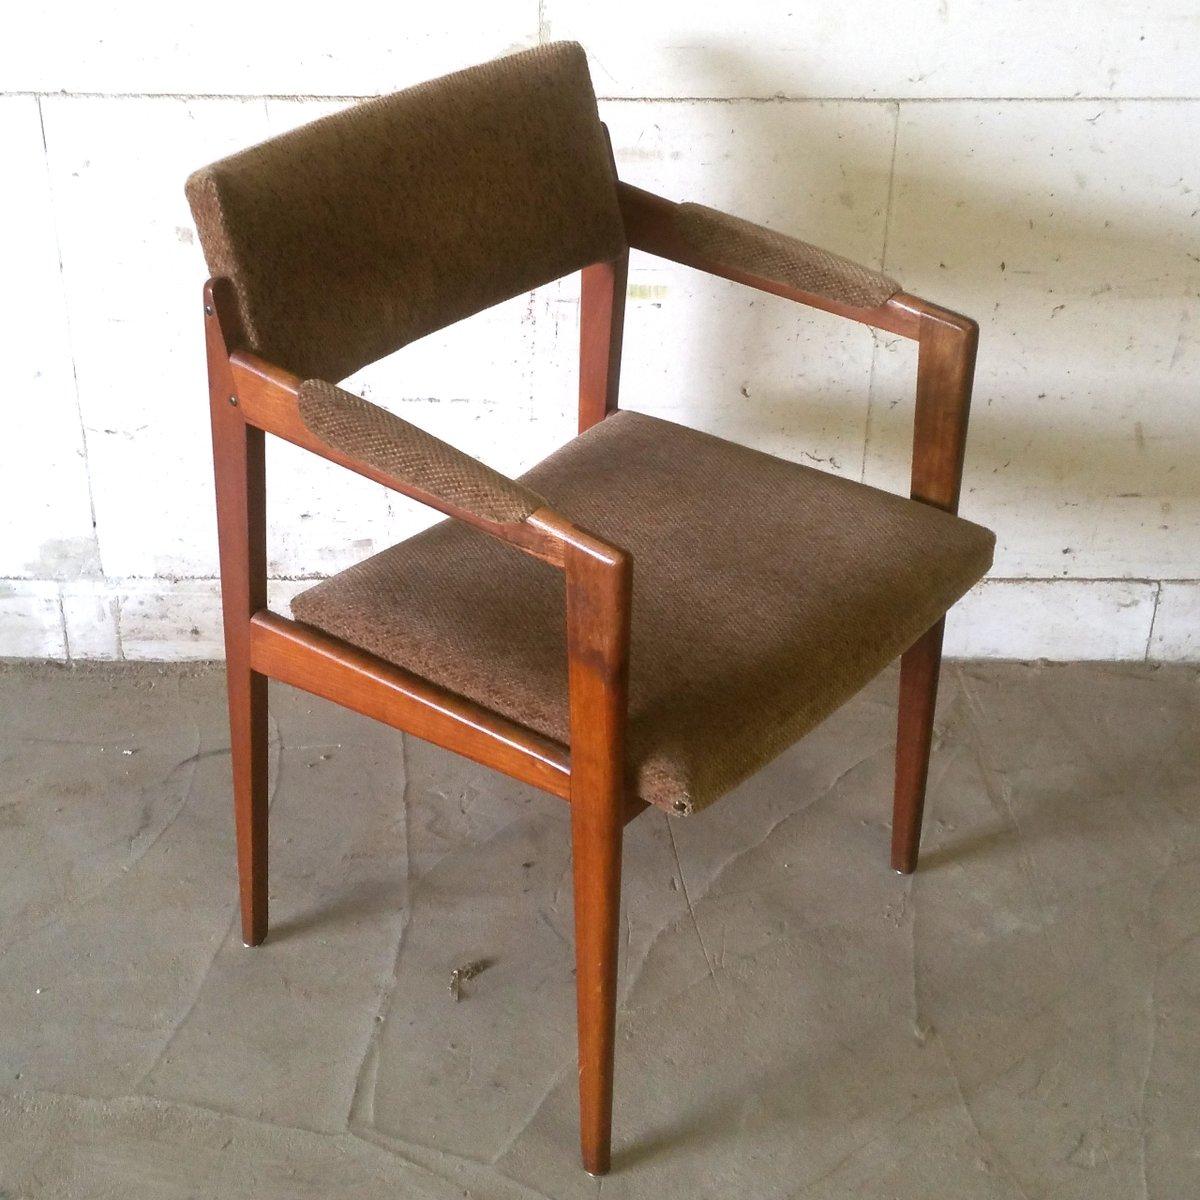 641pf st hle rudolf glatzel f r thonet 1961 4er set bei pamono kaufen. Black Bedroom Furniture Sets. Home Design Ideas